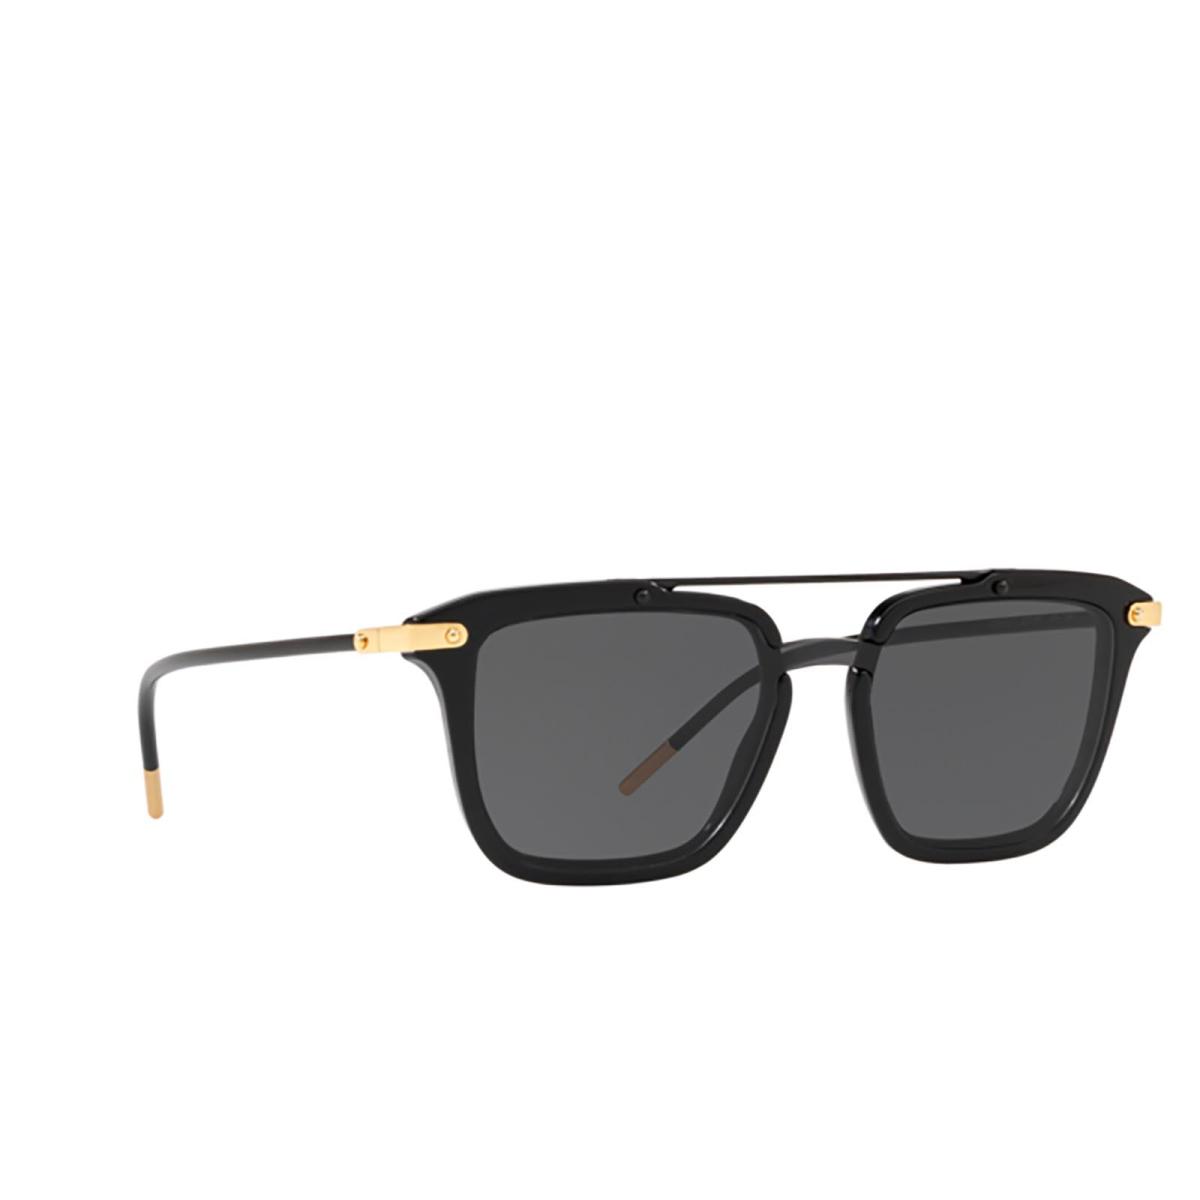 Dolce & Gabbana® Square Sunglasses: DG4327 color Black 501/87 - 2/3.